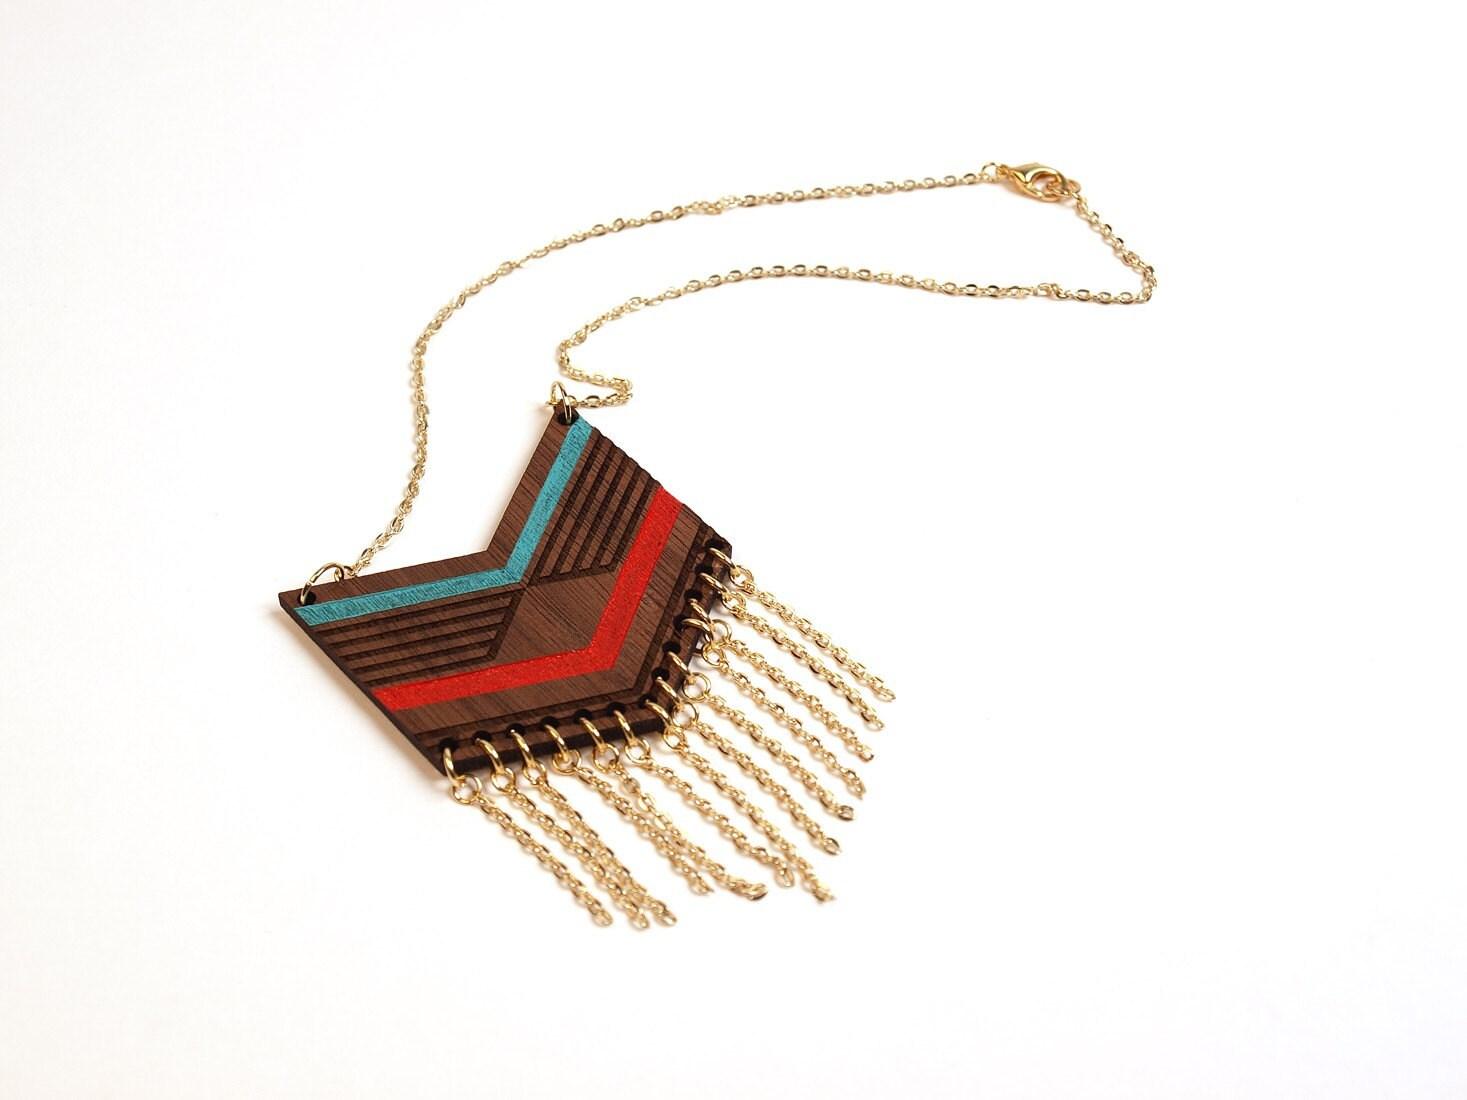 MEXI - Laser cut walnut fringe necklace, color